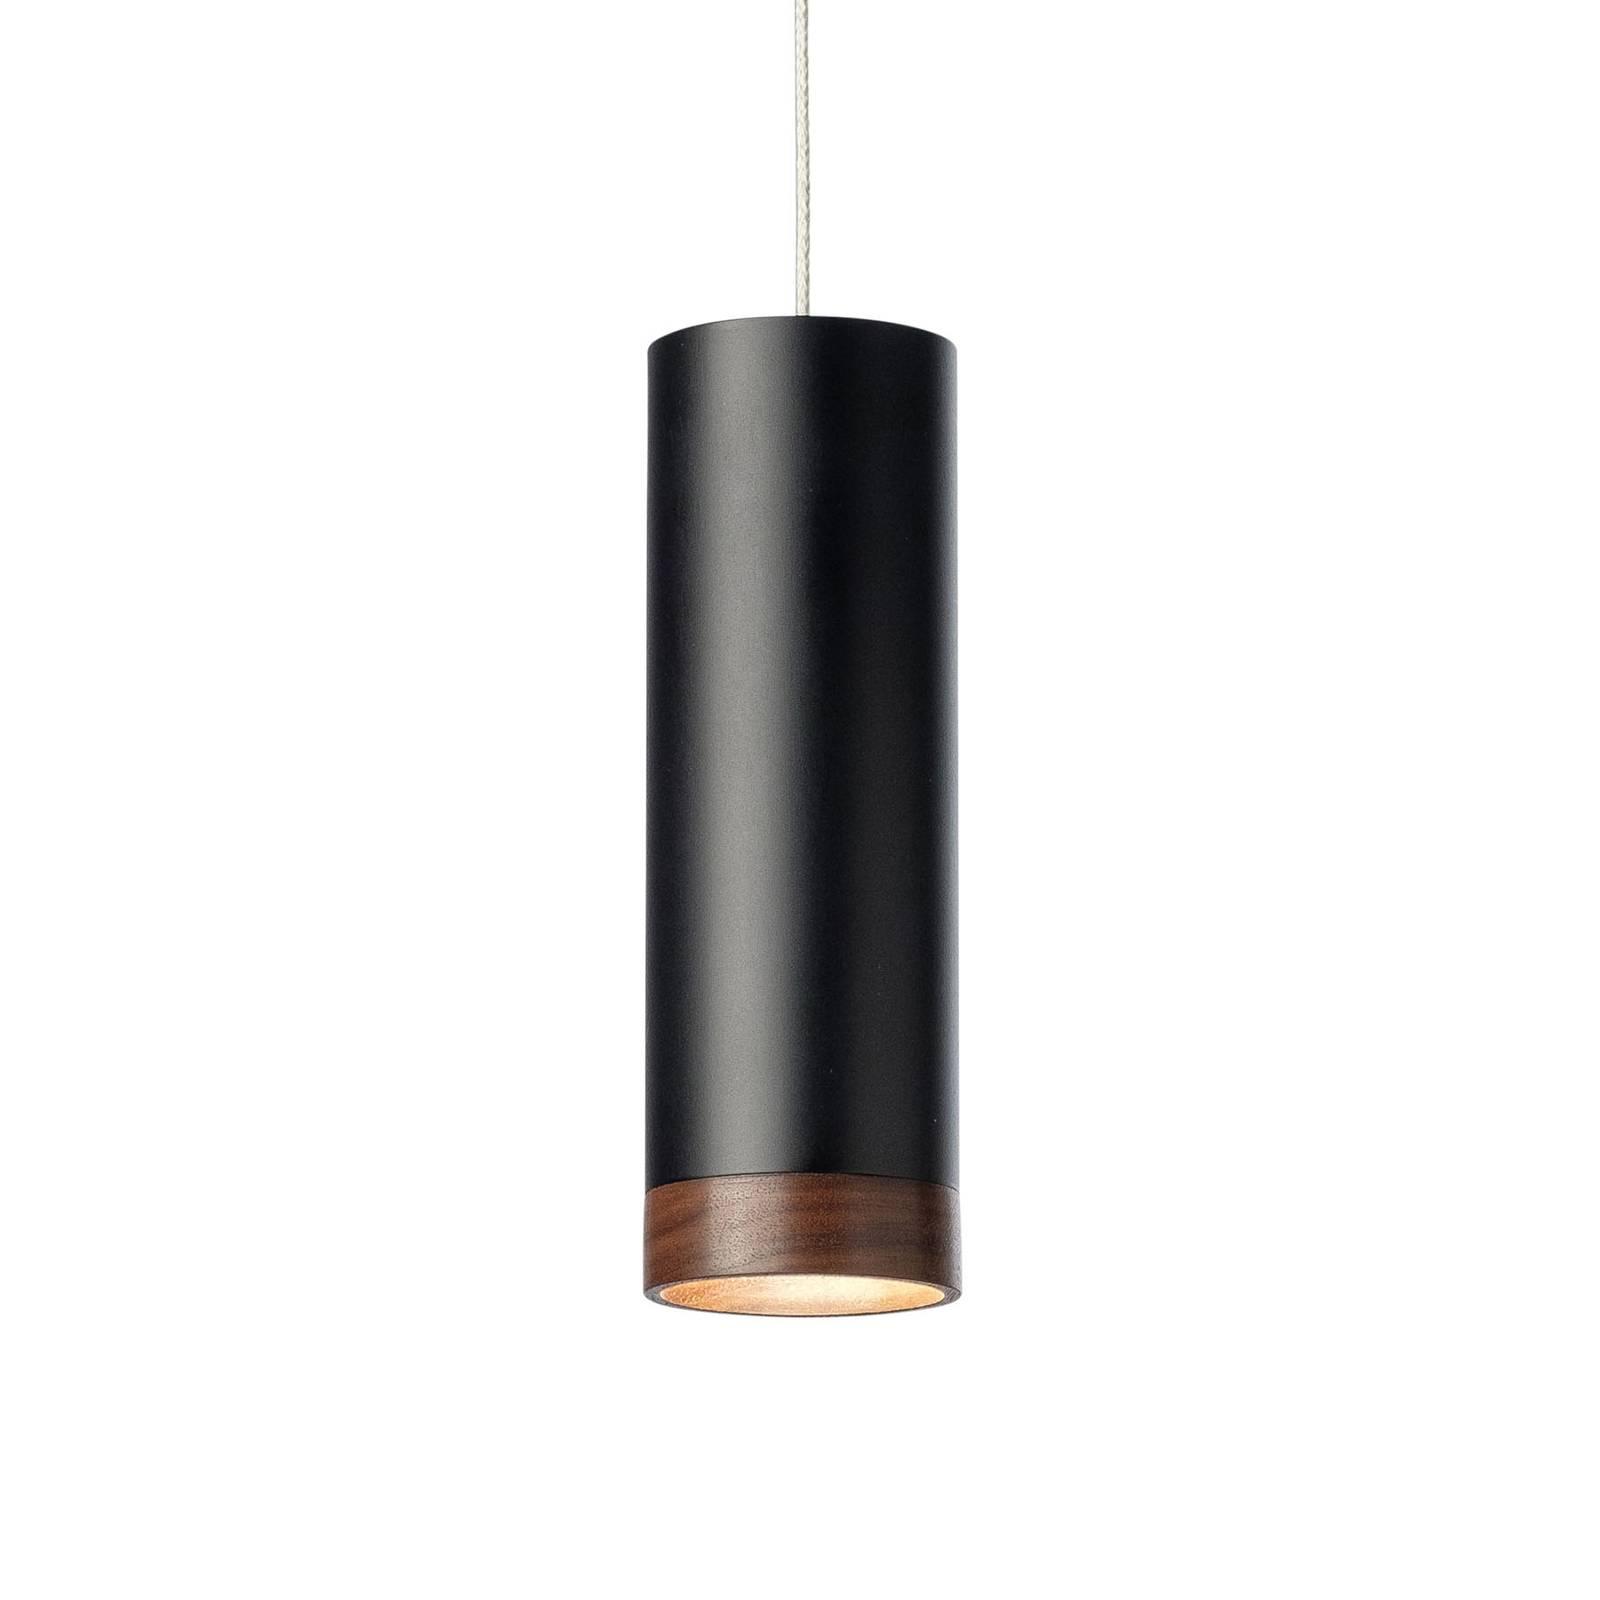 LED-riippuvalaisin PHEB, musta/pähkinäpuu